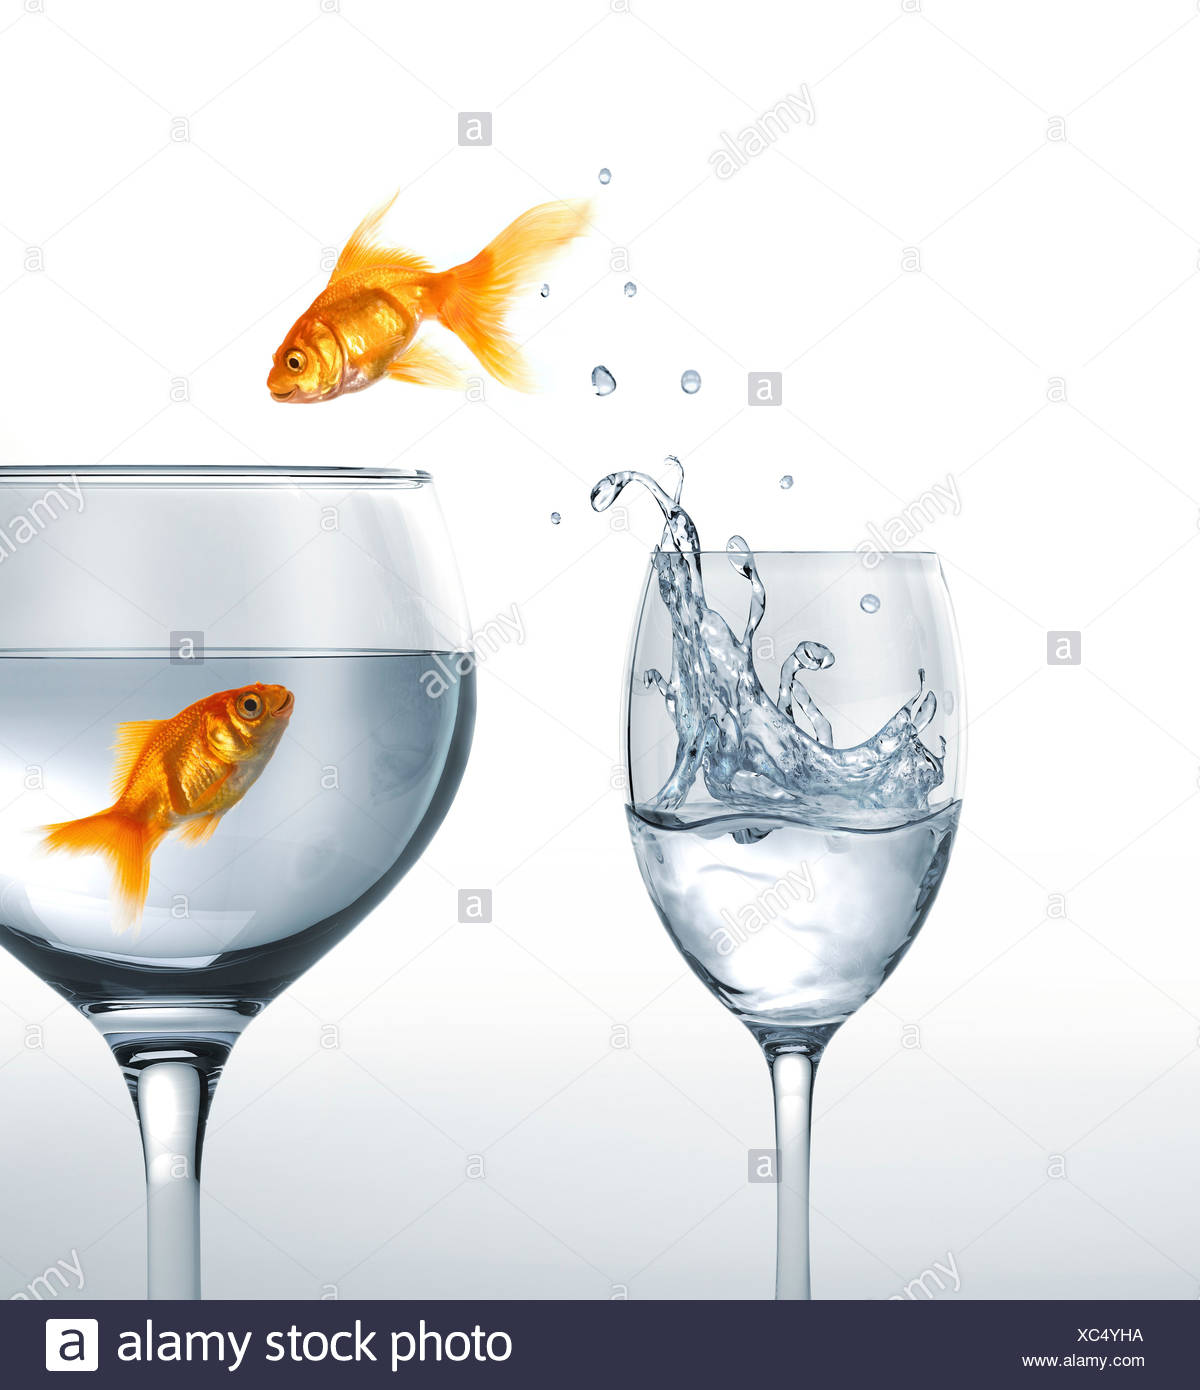 Jumping goldfish artwork Foto Stock